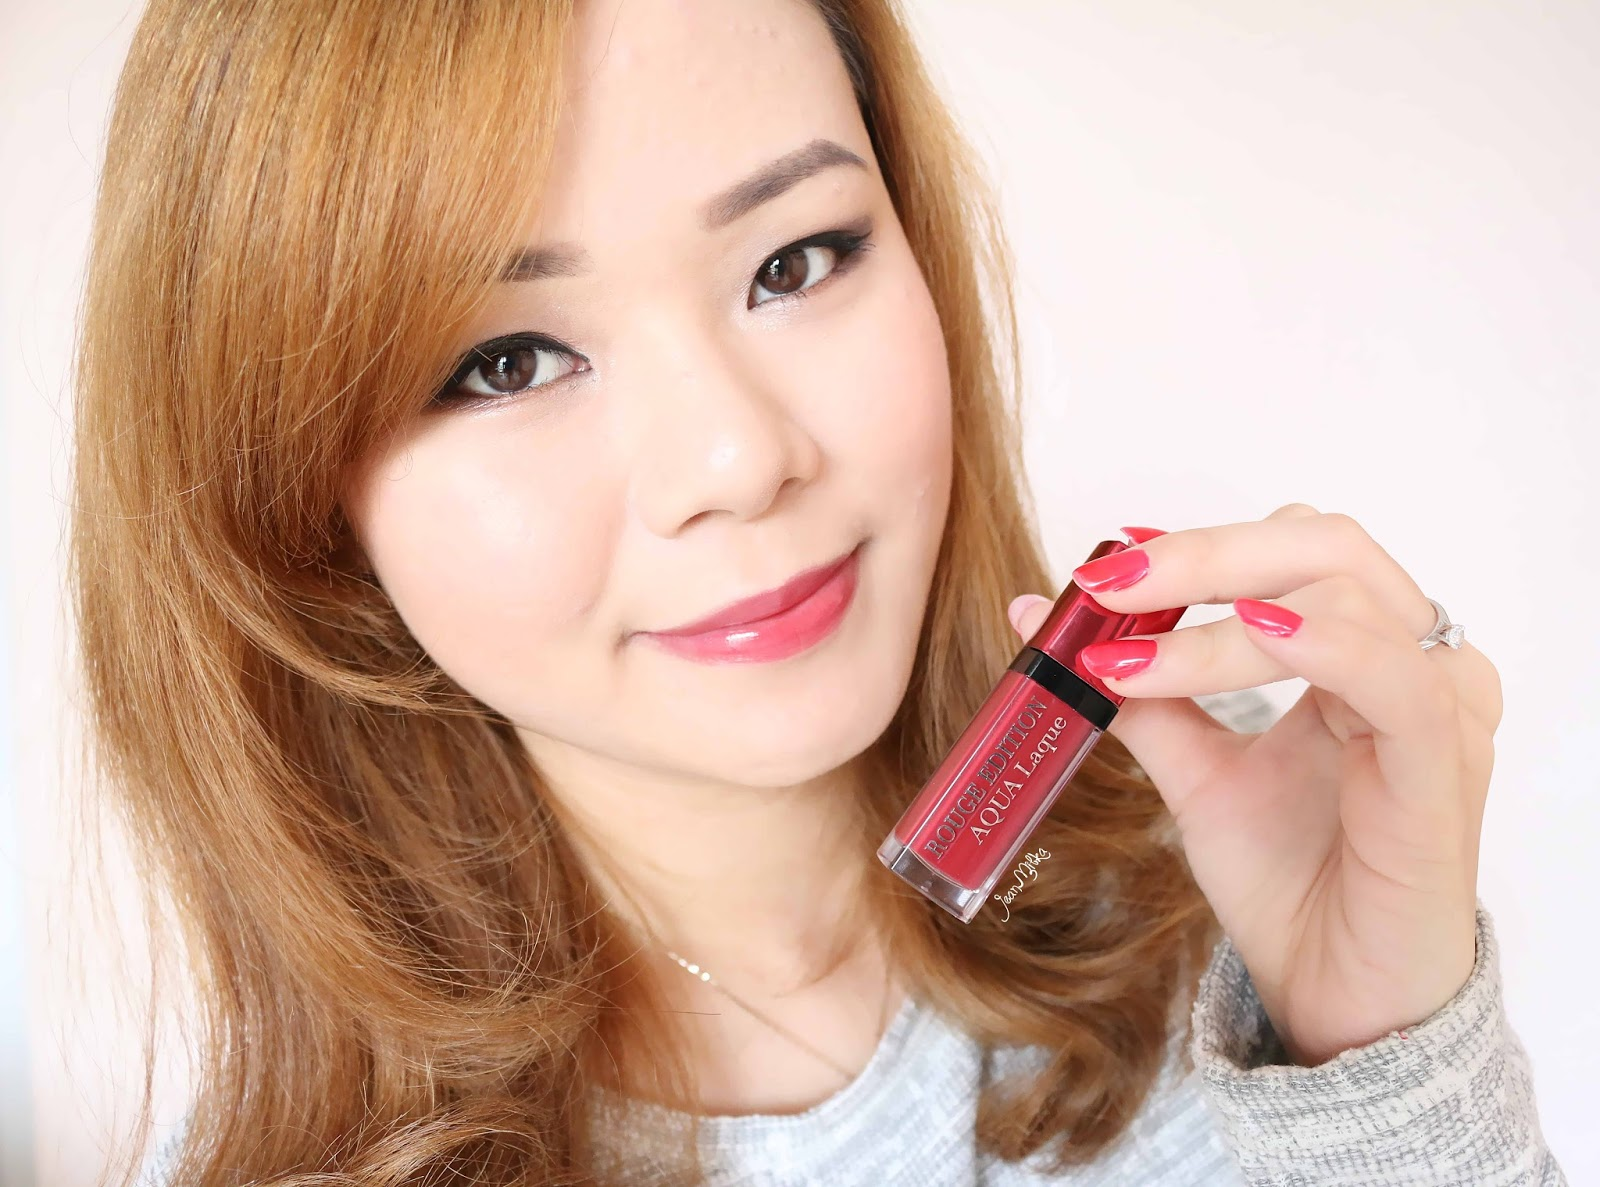 bourjois, bourjois lipstick, rouge edition aqua laque, bourjois aqua laque, lip lacquer, review, jean milka, jeanmilka